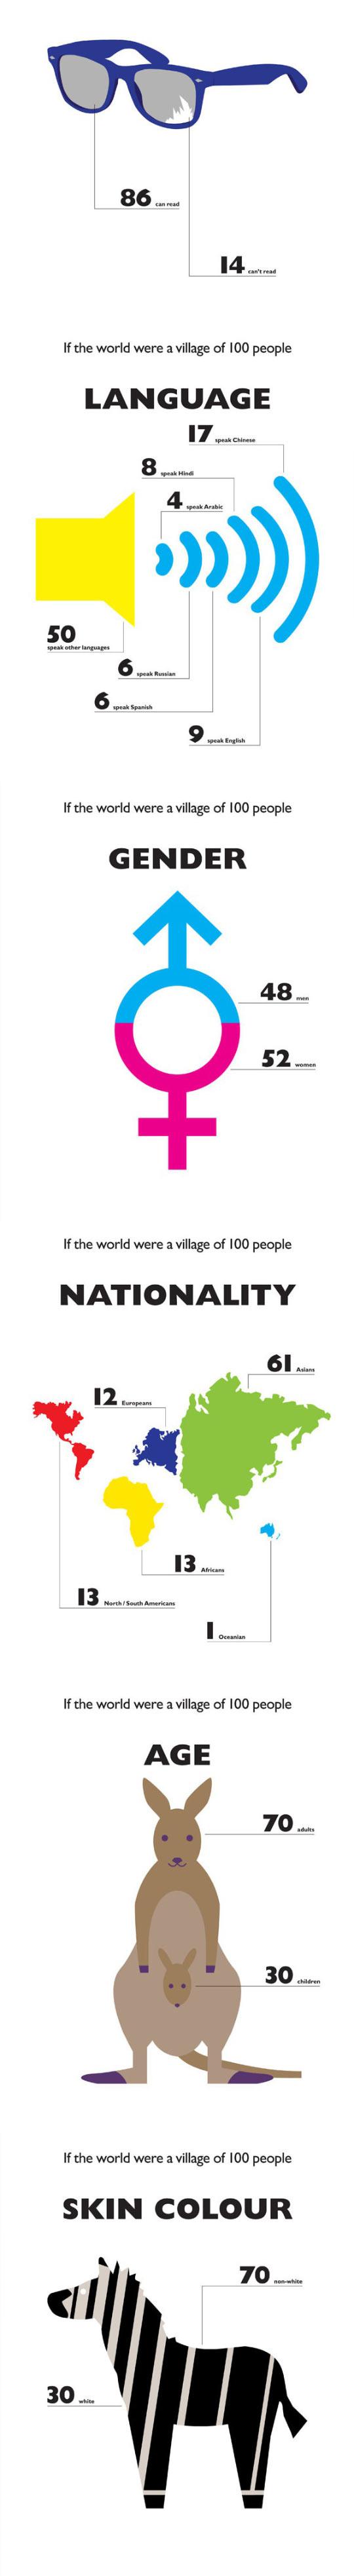 4cool-world-village-one-hundred-language